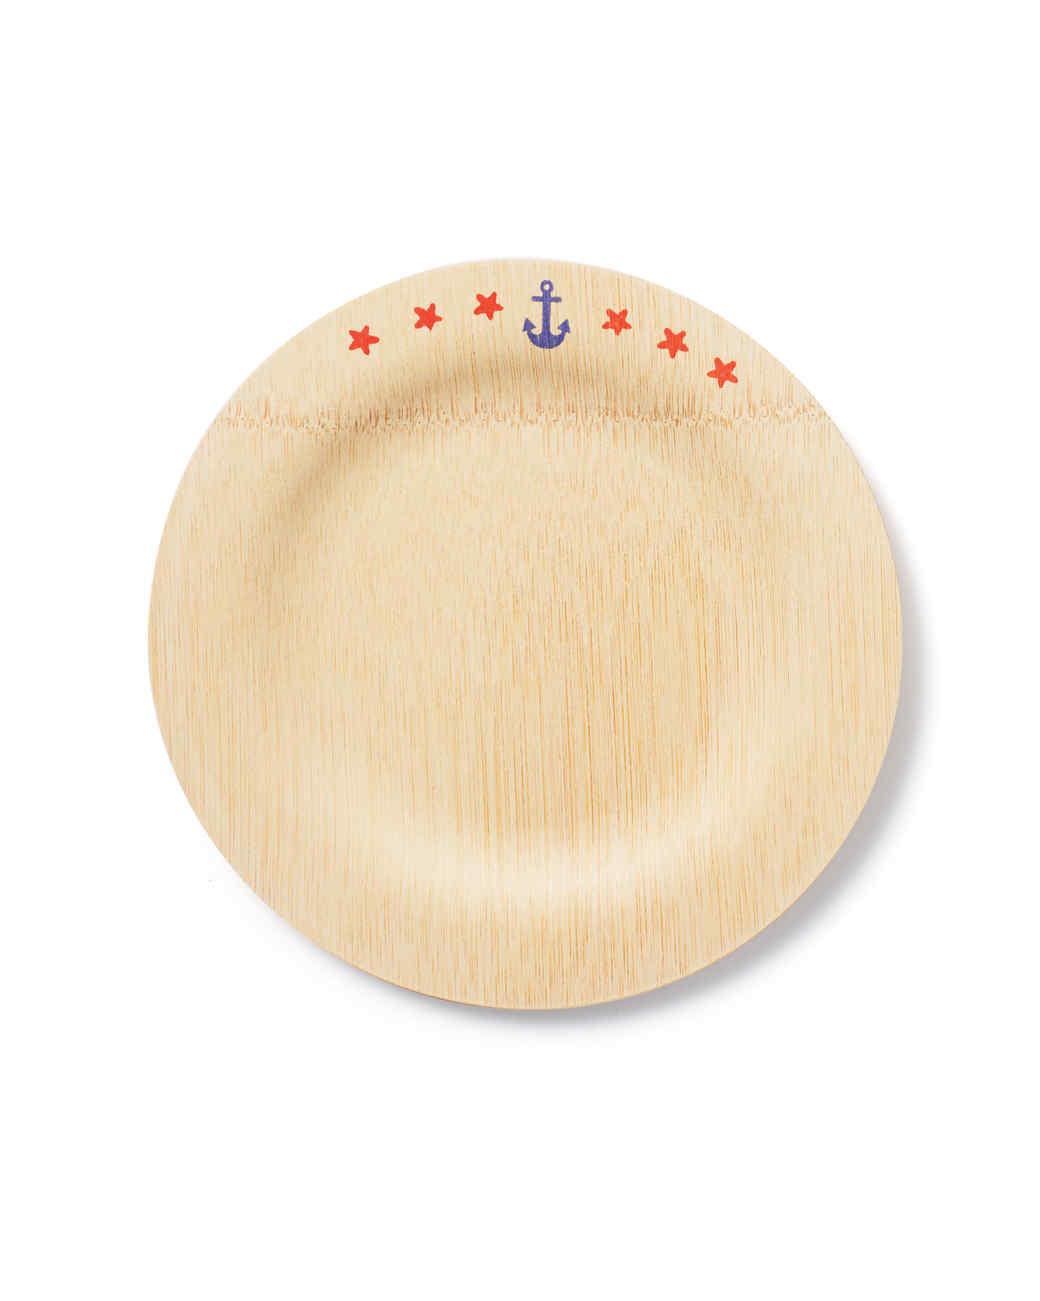 bambu-plates-020-d111215.jpg